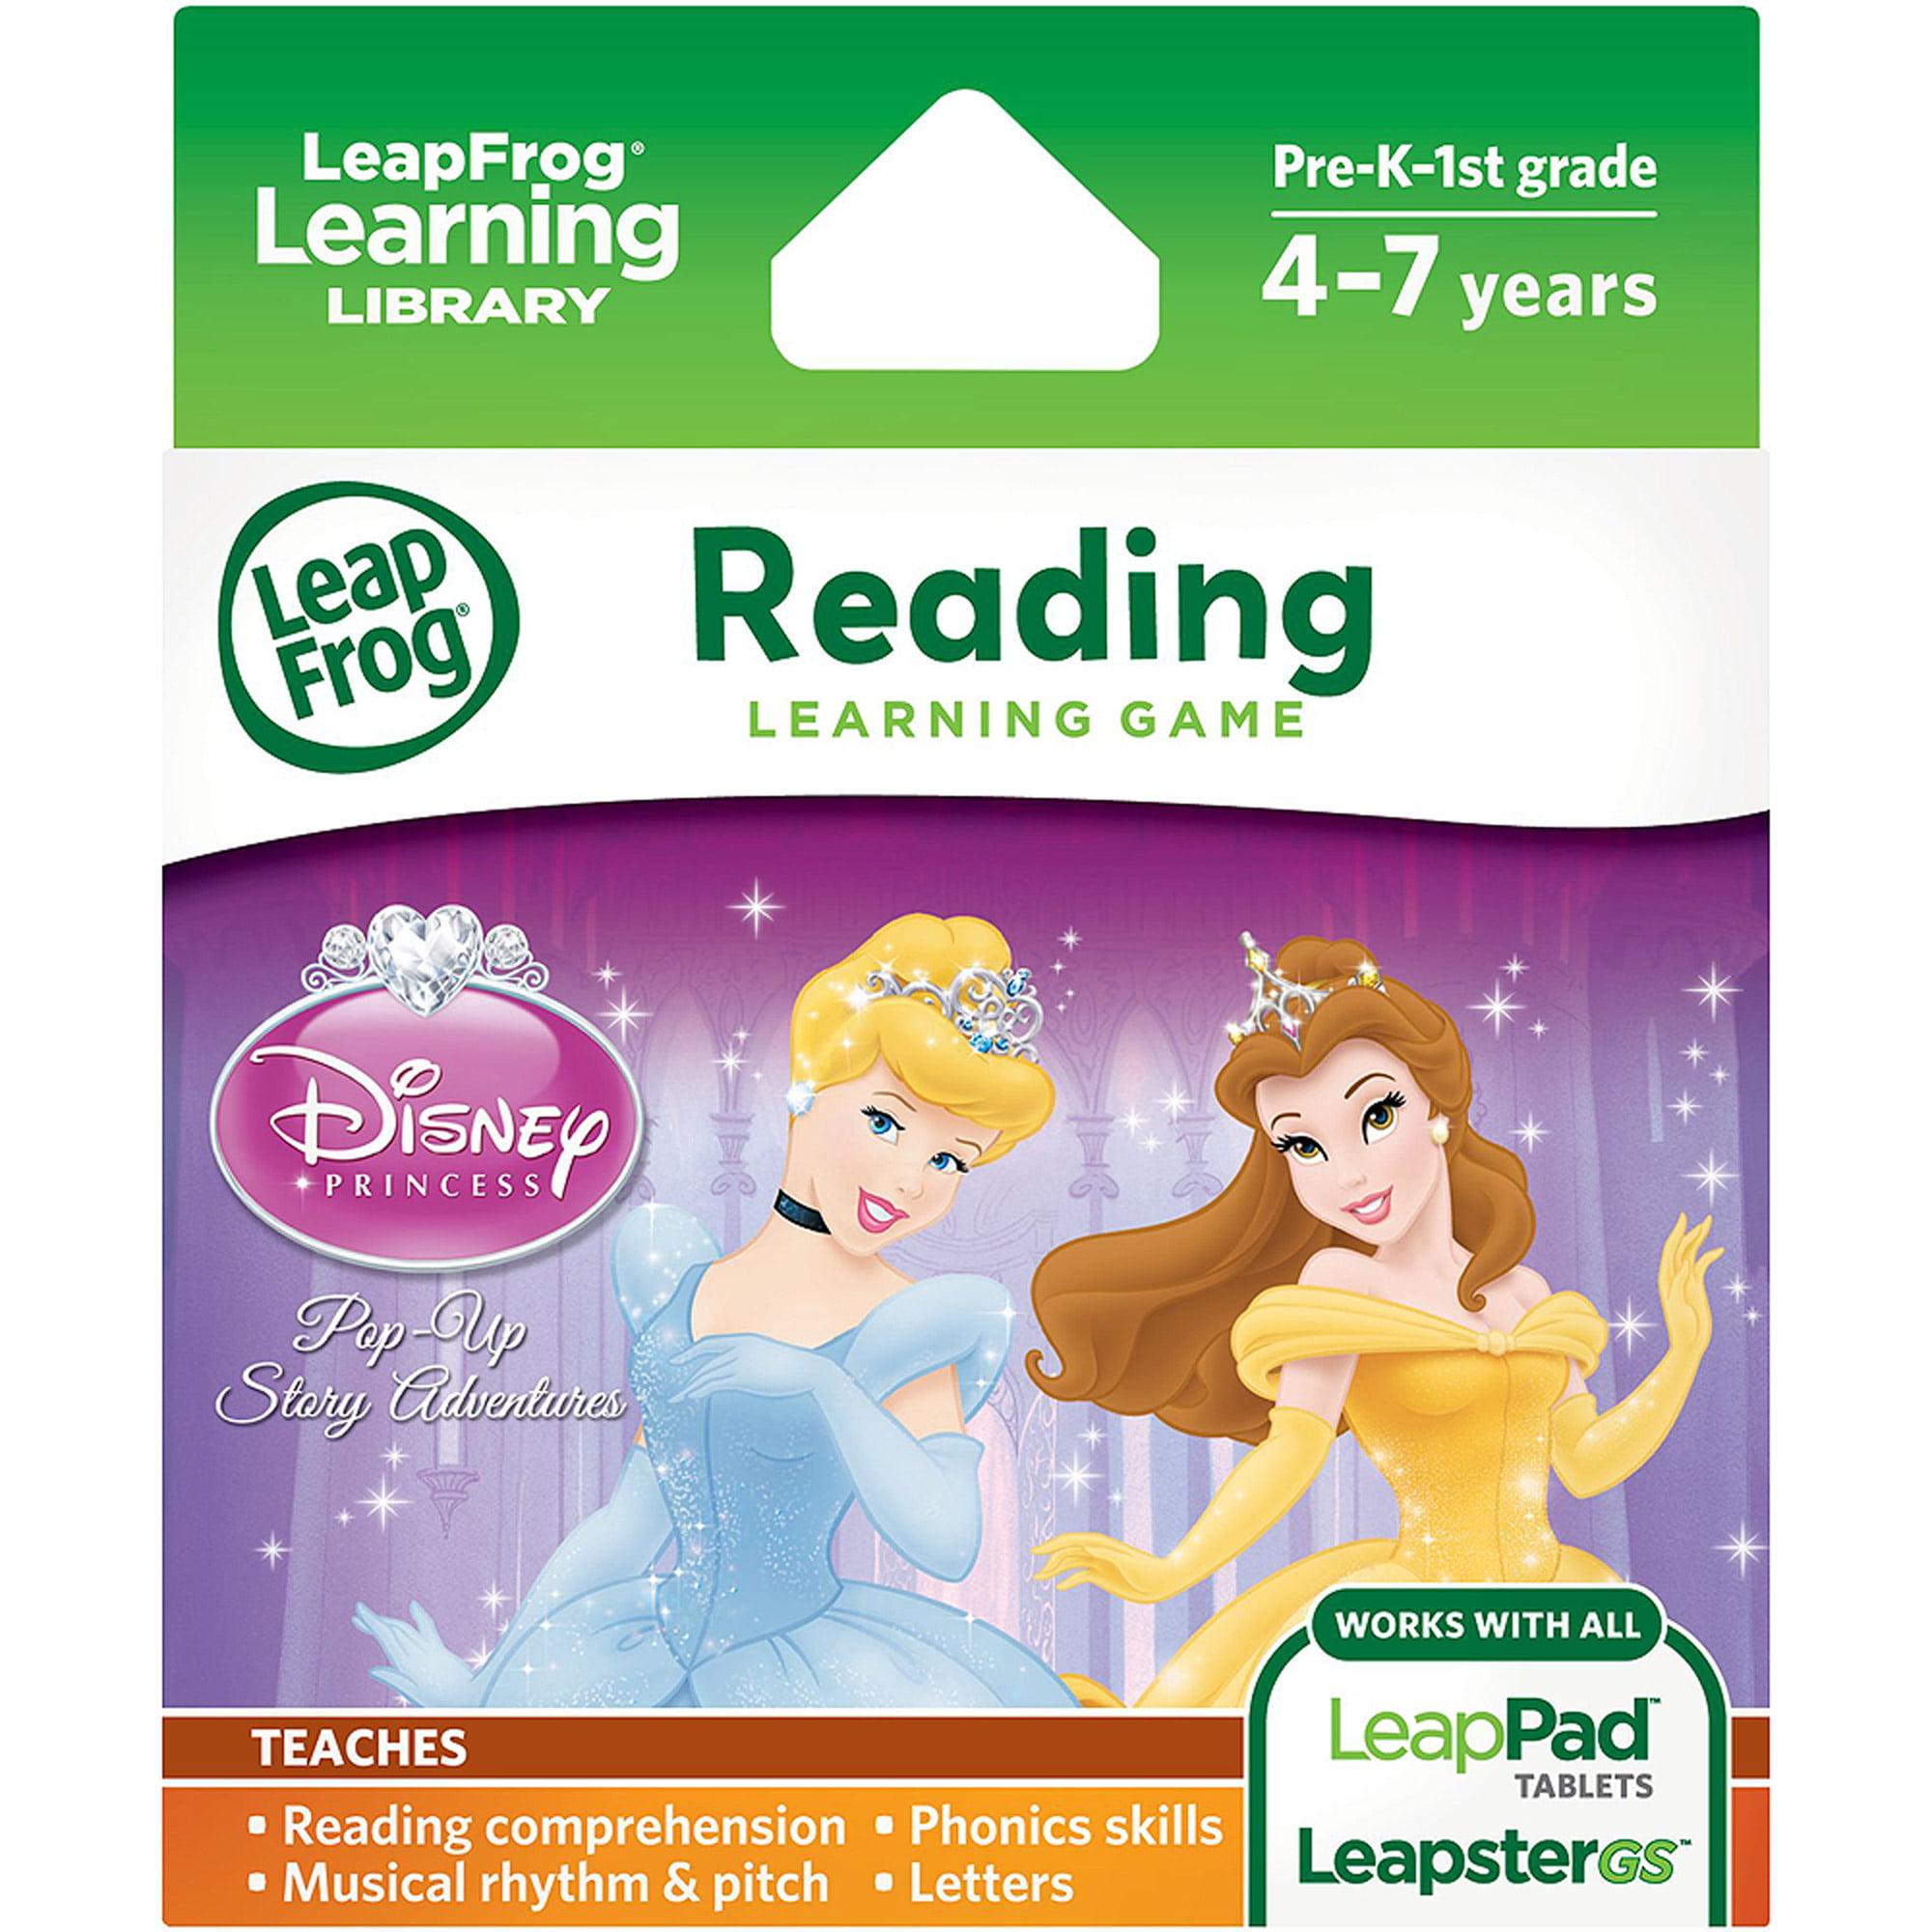 LeapFrog Explorer & LeapPad Learning Game: Disney Princess: Pop-Up Story Adventures by LeapFrog Enterprises, Inc